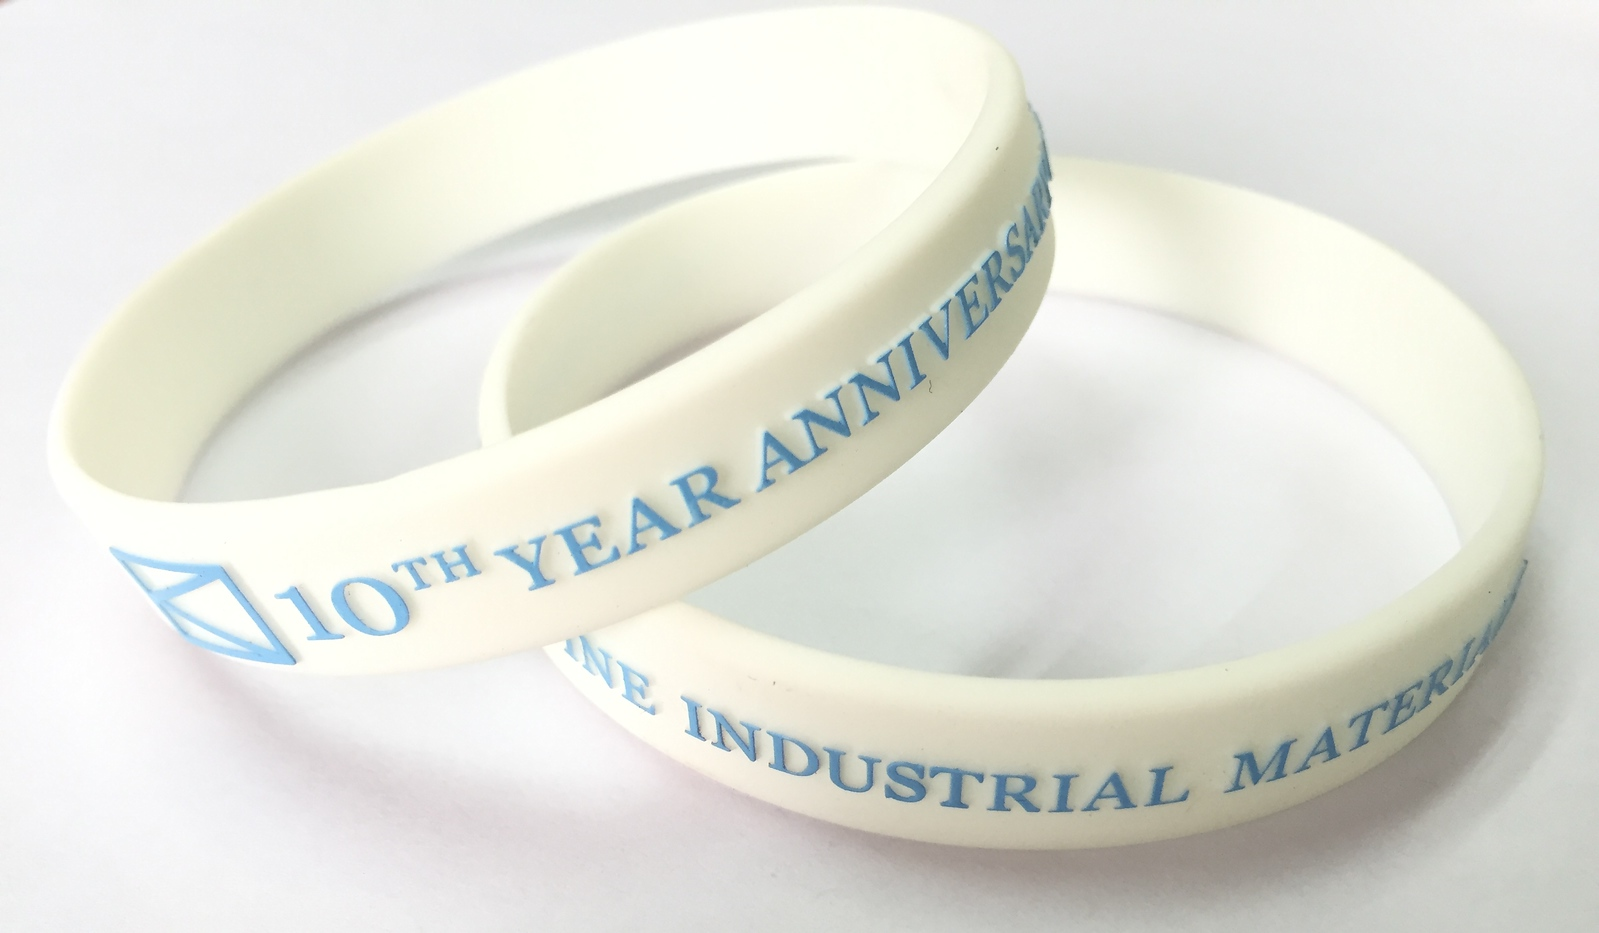 10TH YEAR ANNIVERSAKY PINE INDUSTRIAL MATERIALS ริสแบนด์